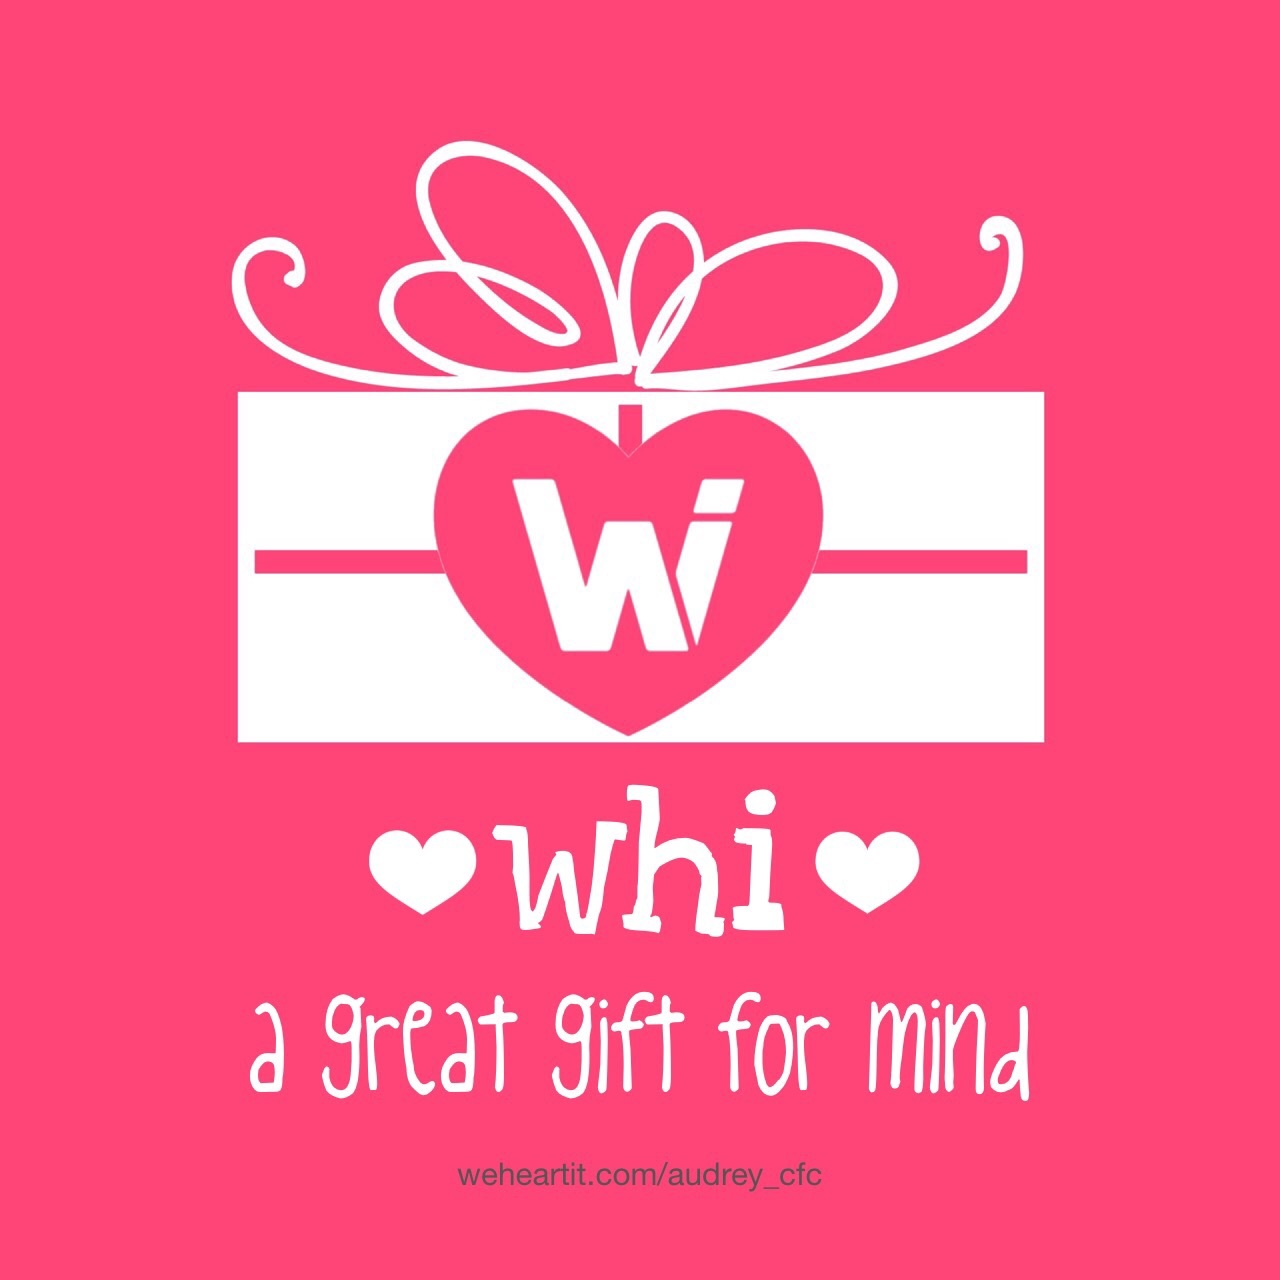 gift and whi image